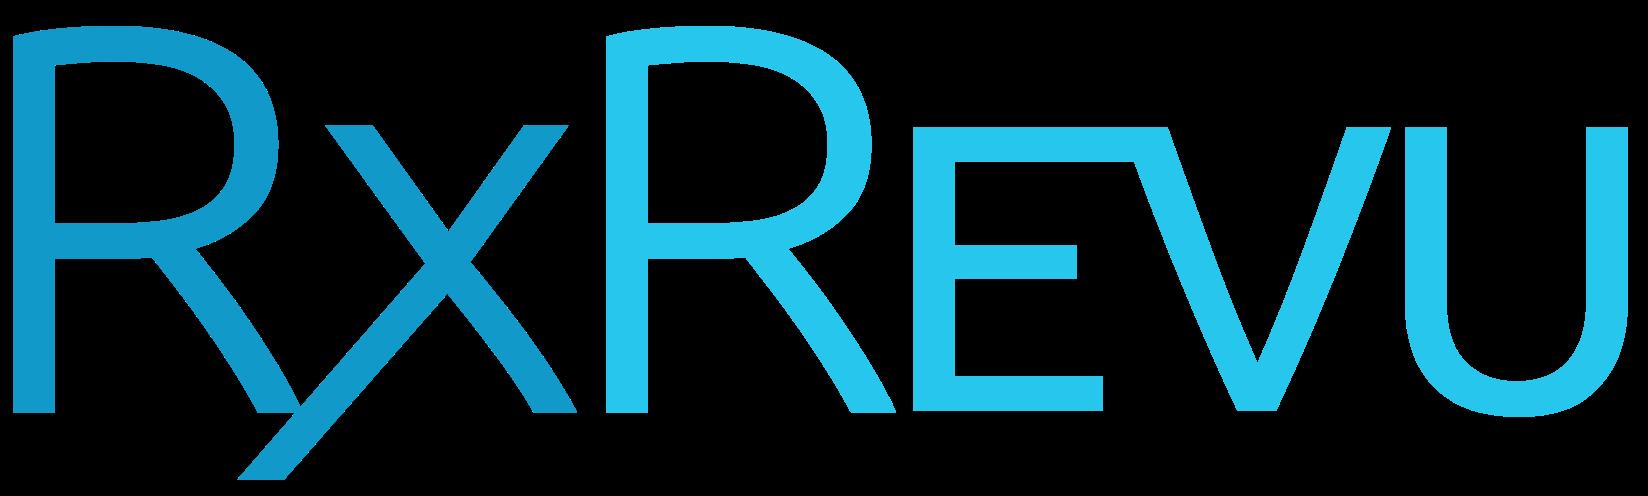 rxrevu logo